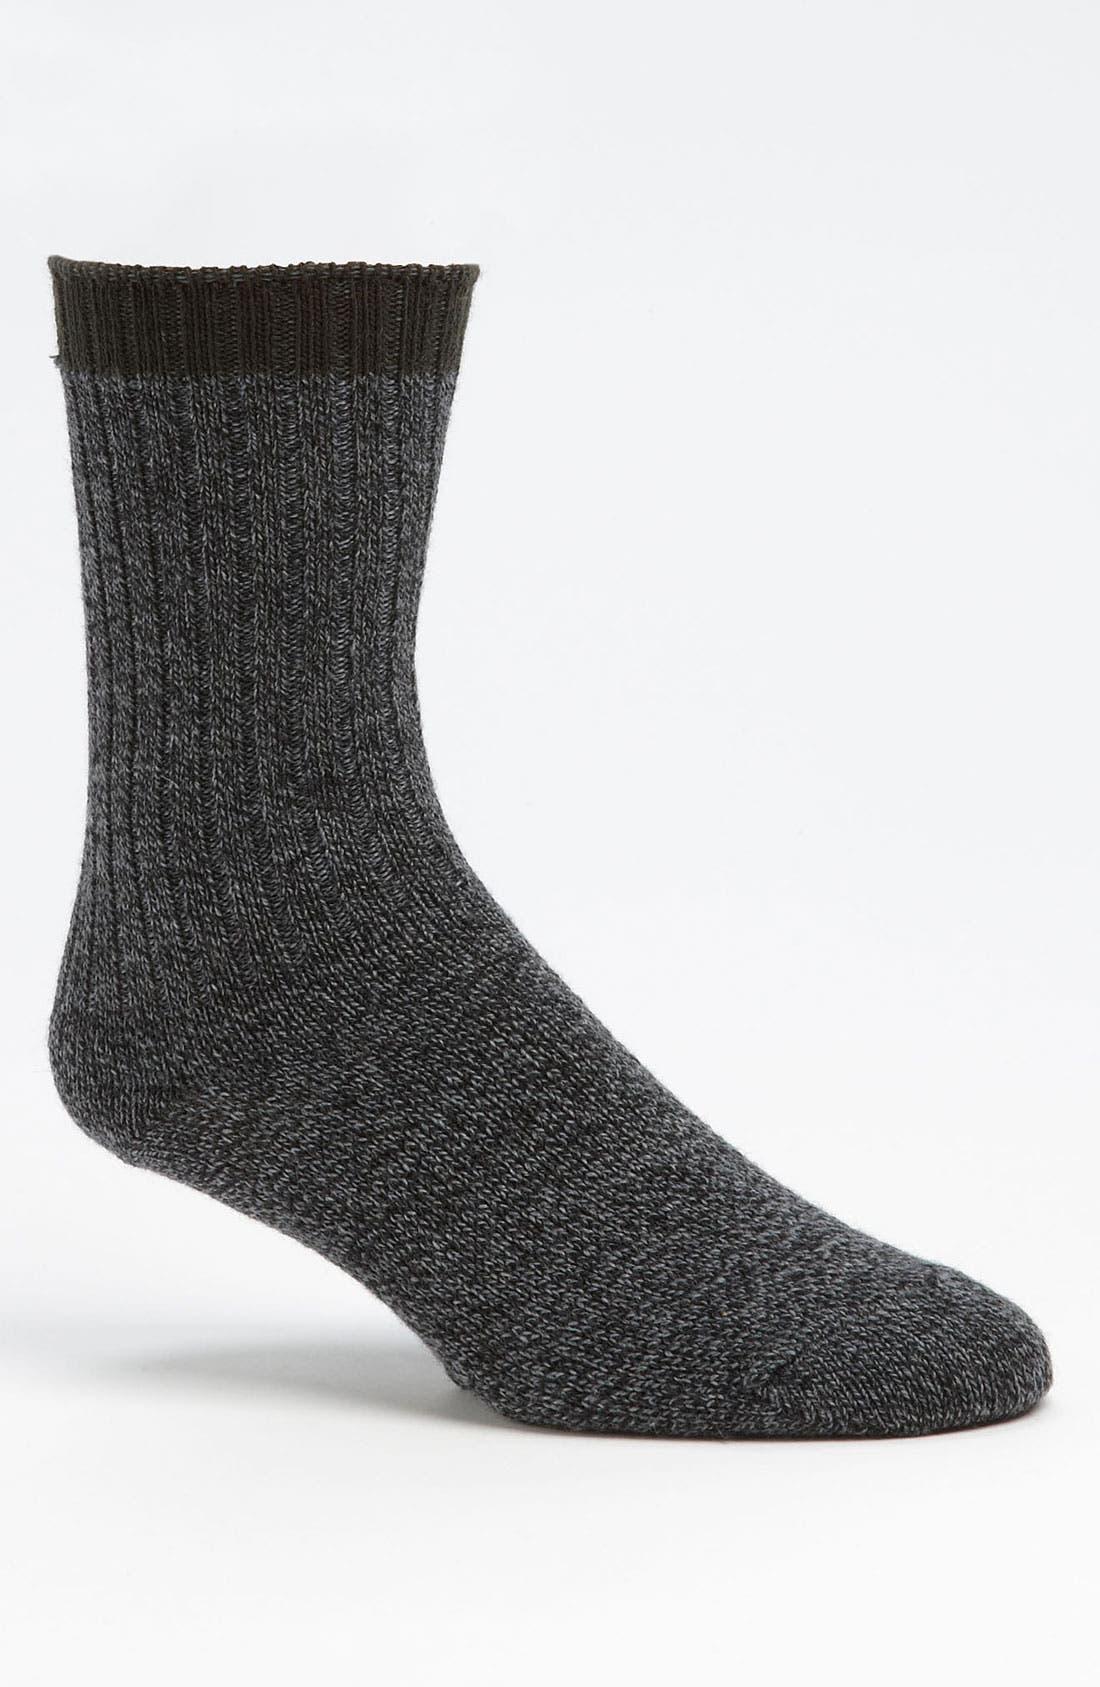 Alternate Image 1 Selected - Smartwool 'Adventurer' Socks